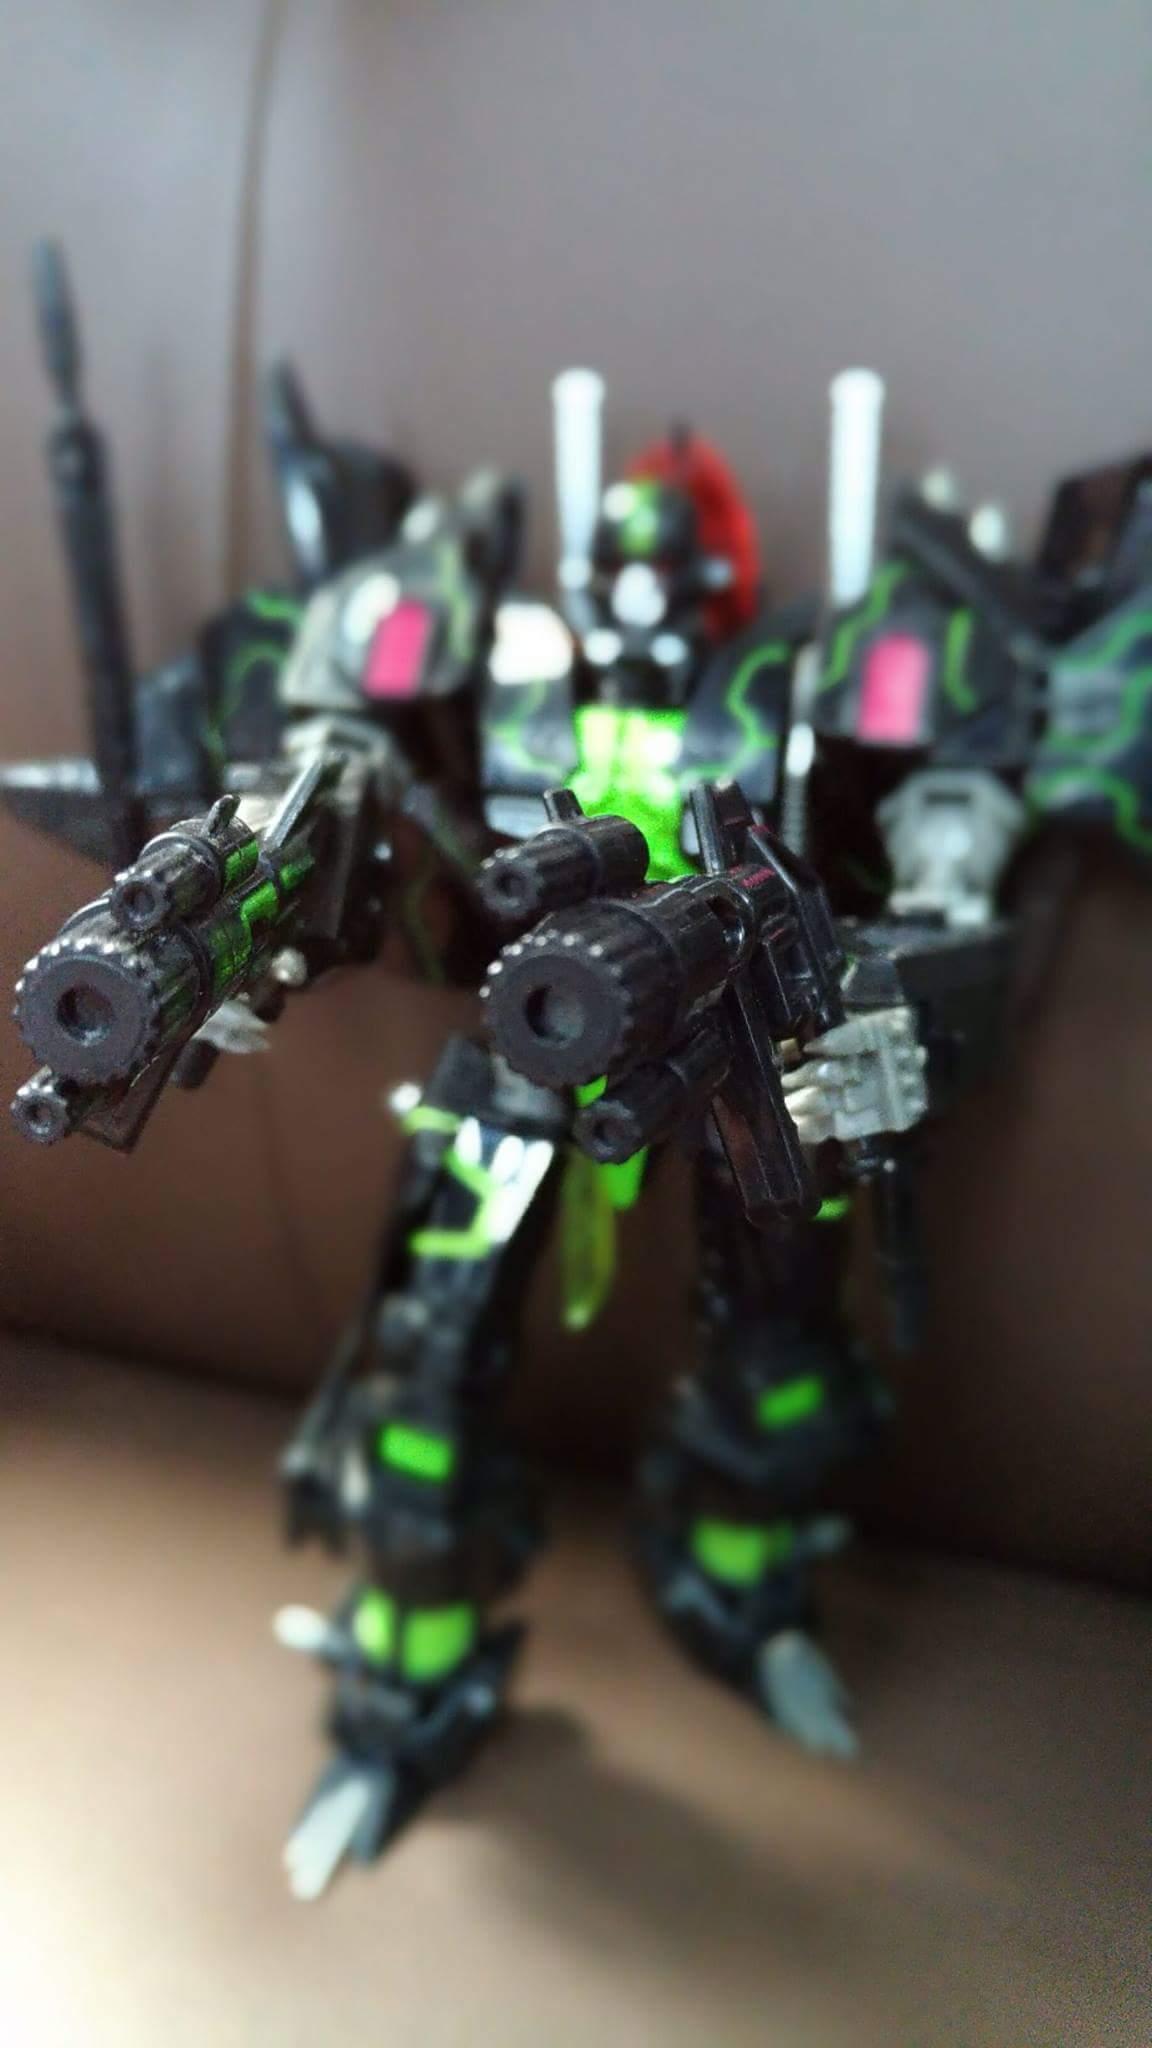 [Mastermind Creations] Produit Tiers - R-15 Jaegertron - aka Lockdown des BD IDW - Page 2 X9BHmQot